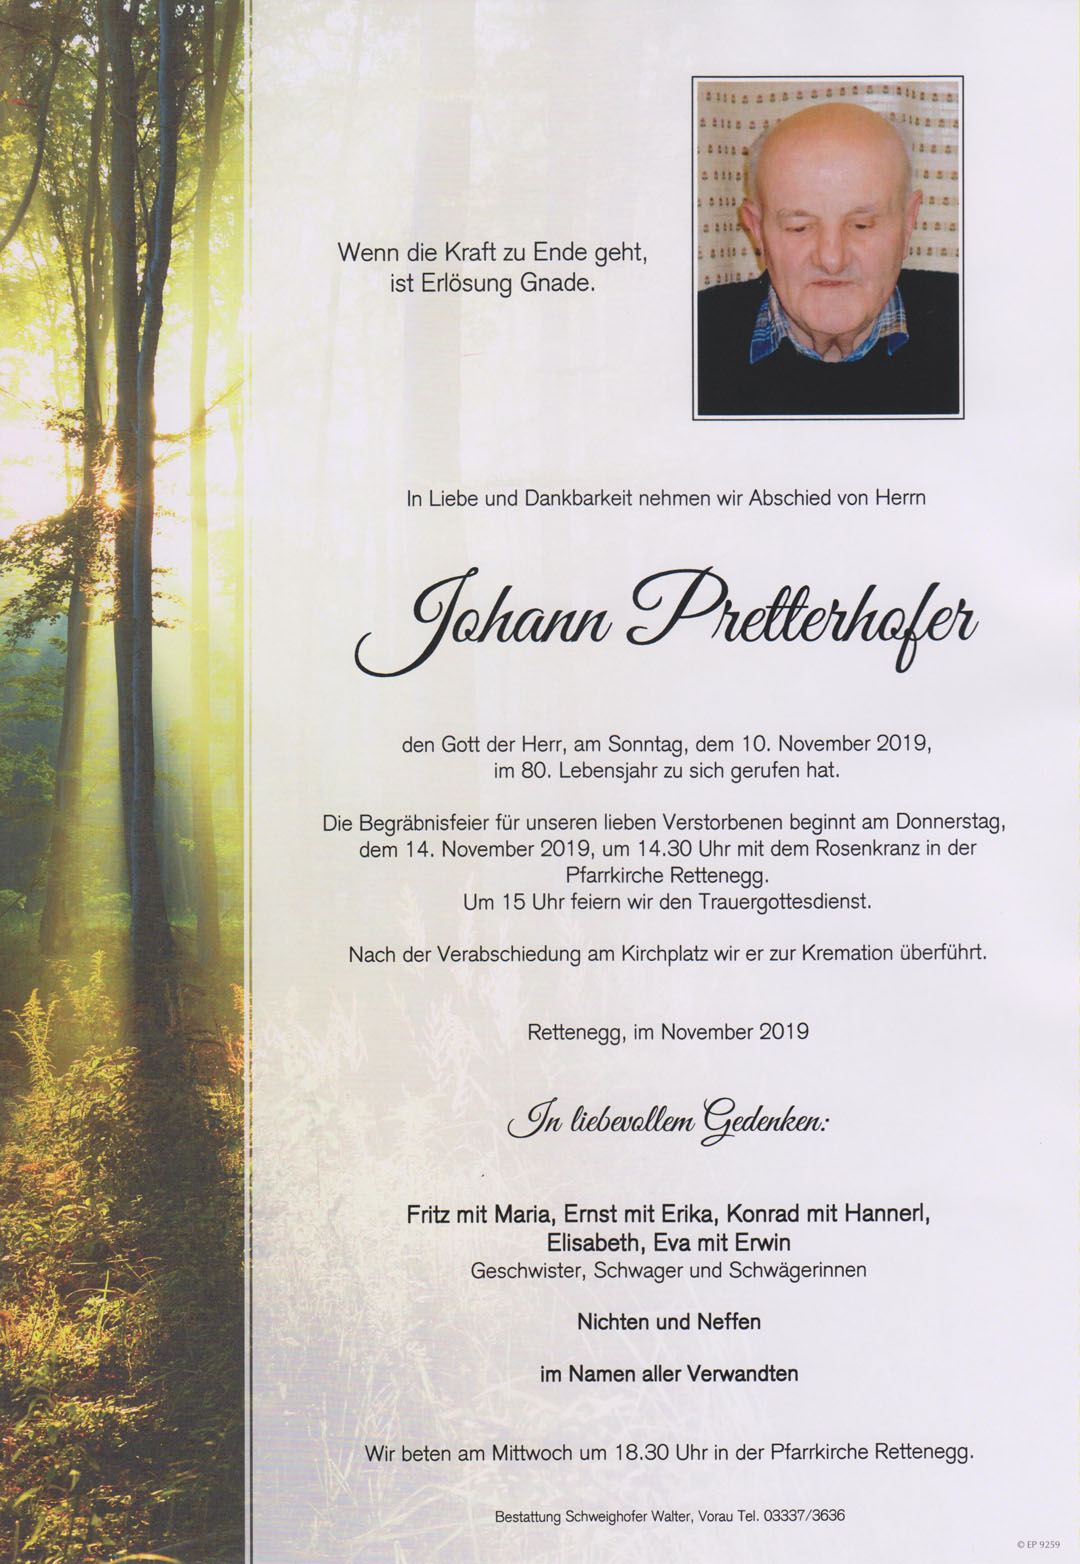 Johann Prettenhofer